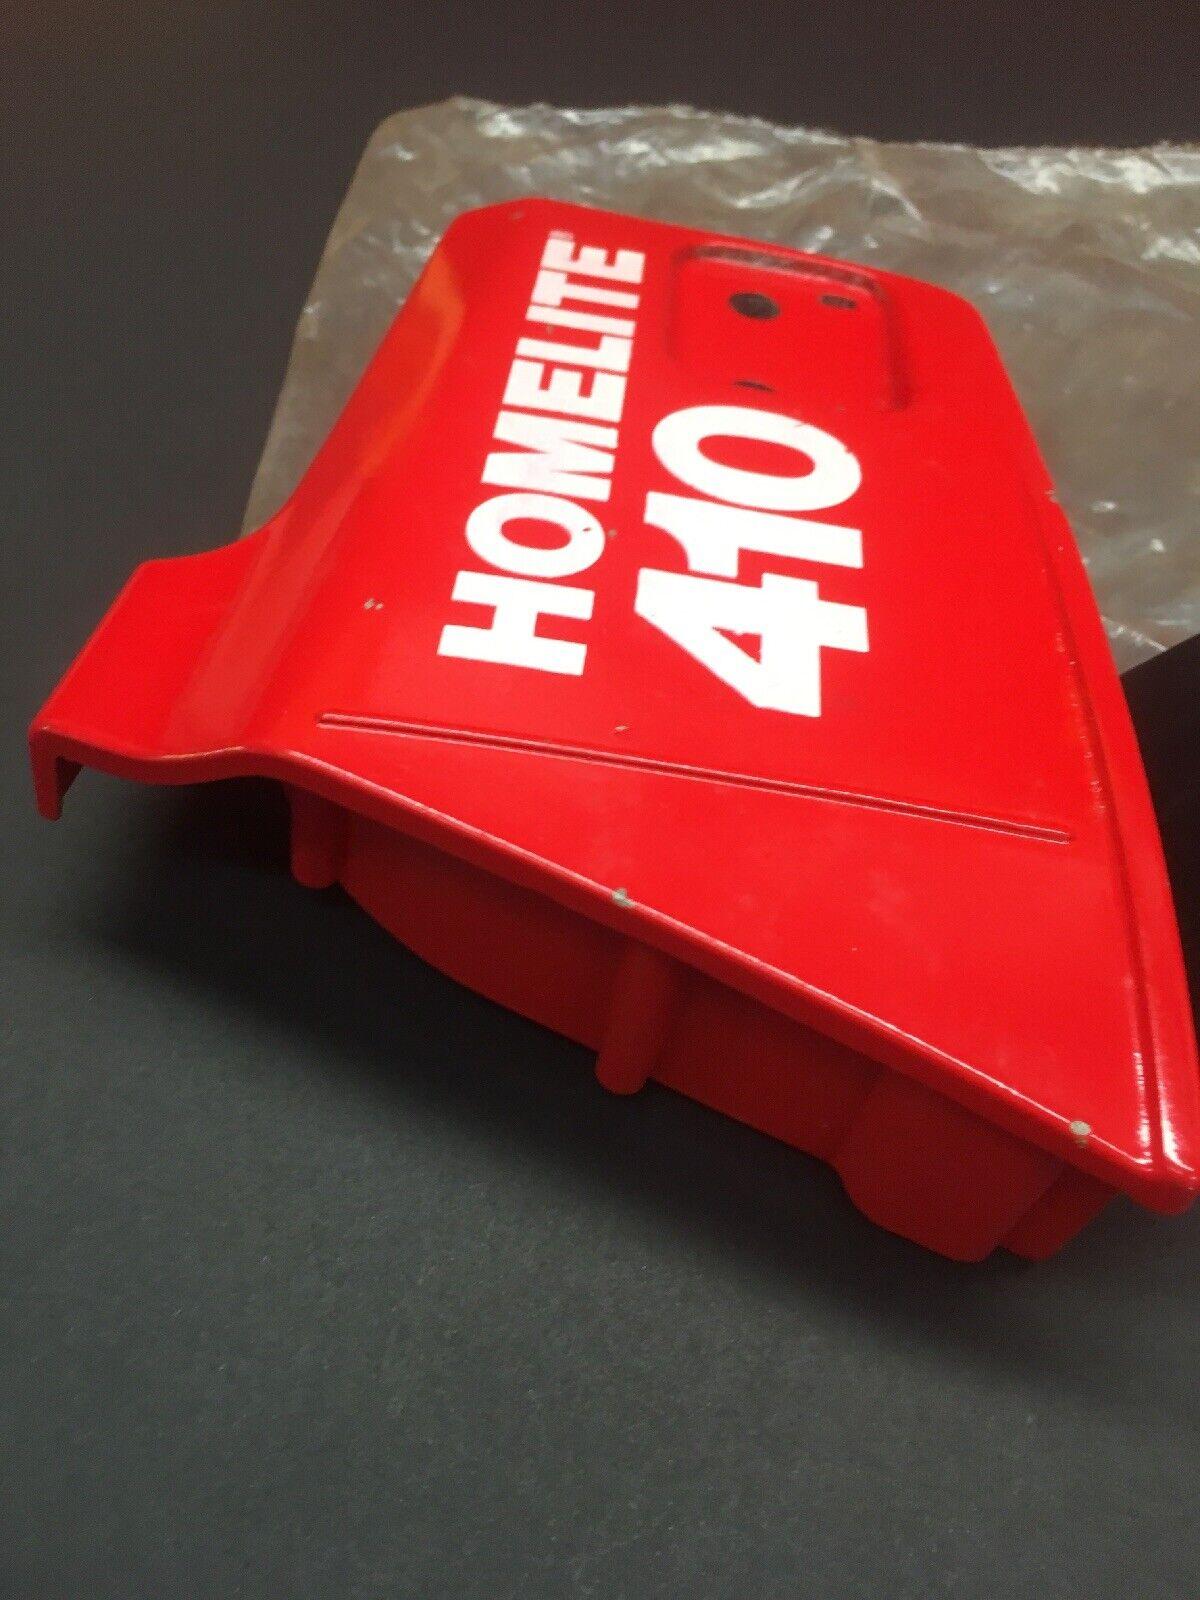 HOMELITE NEW SAFETY BAR TIP 150 XL-12 550 410 360 SUPER EZ 925 SXLAO 330